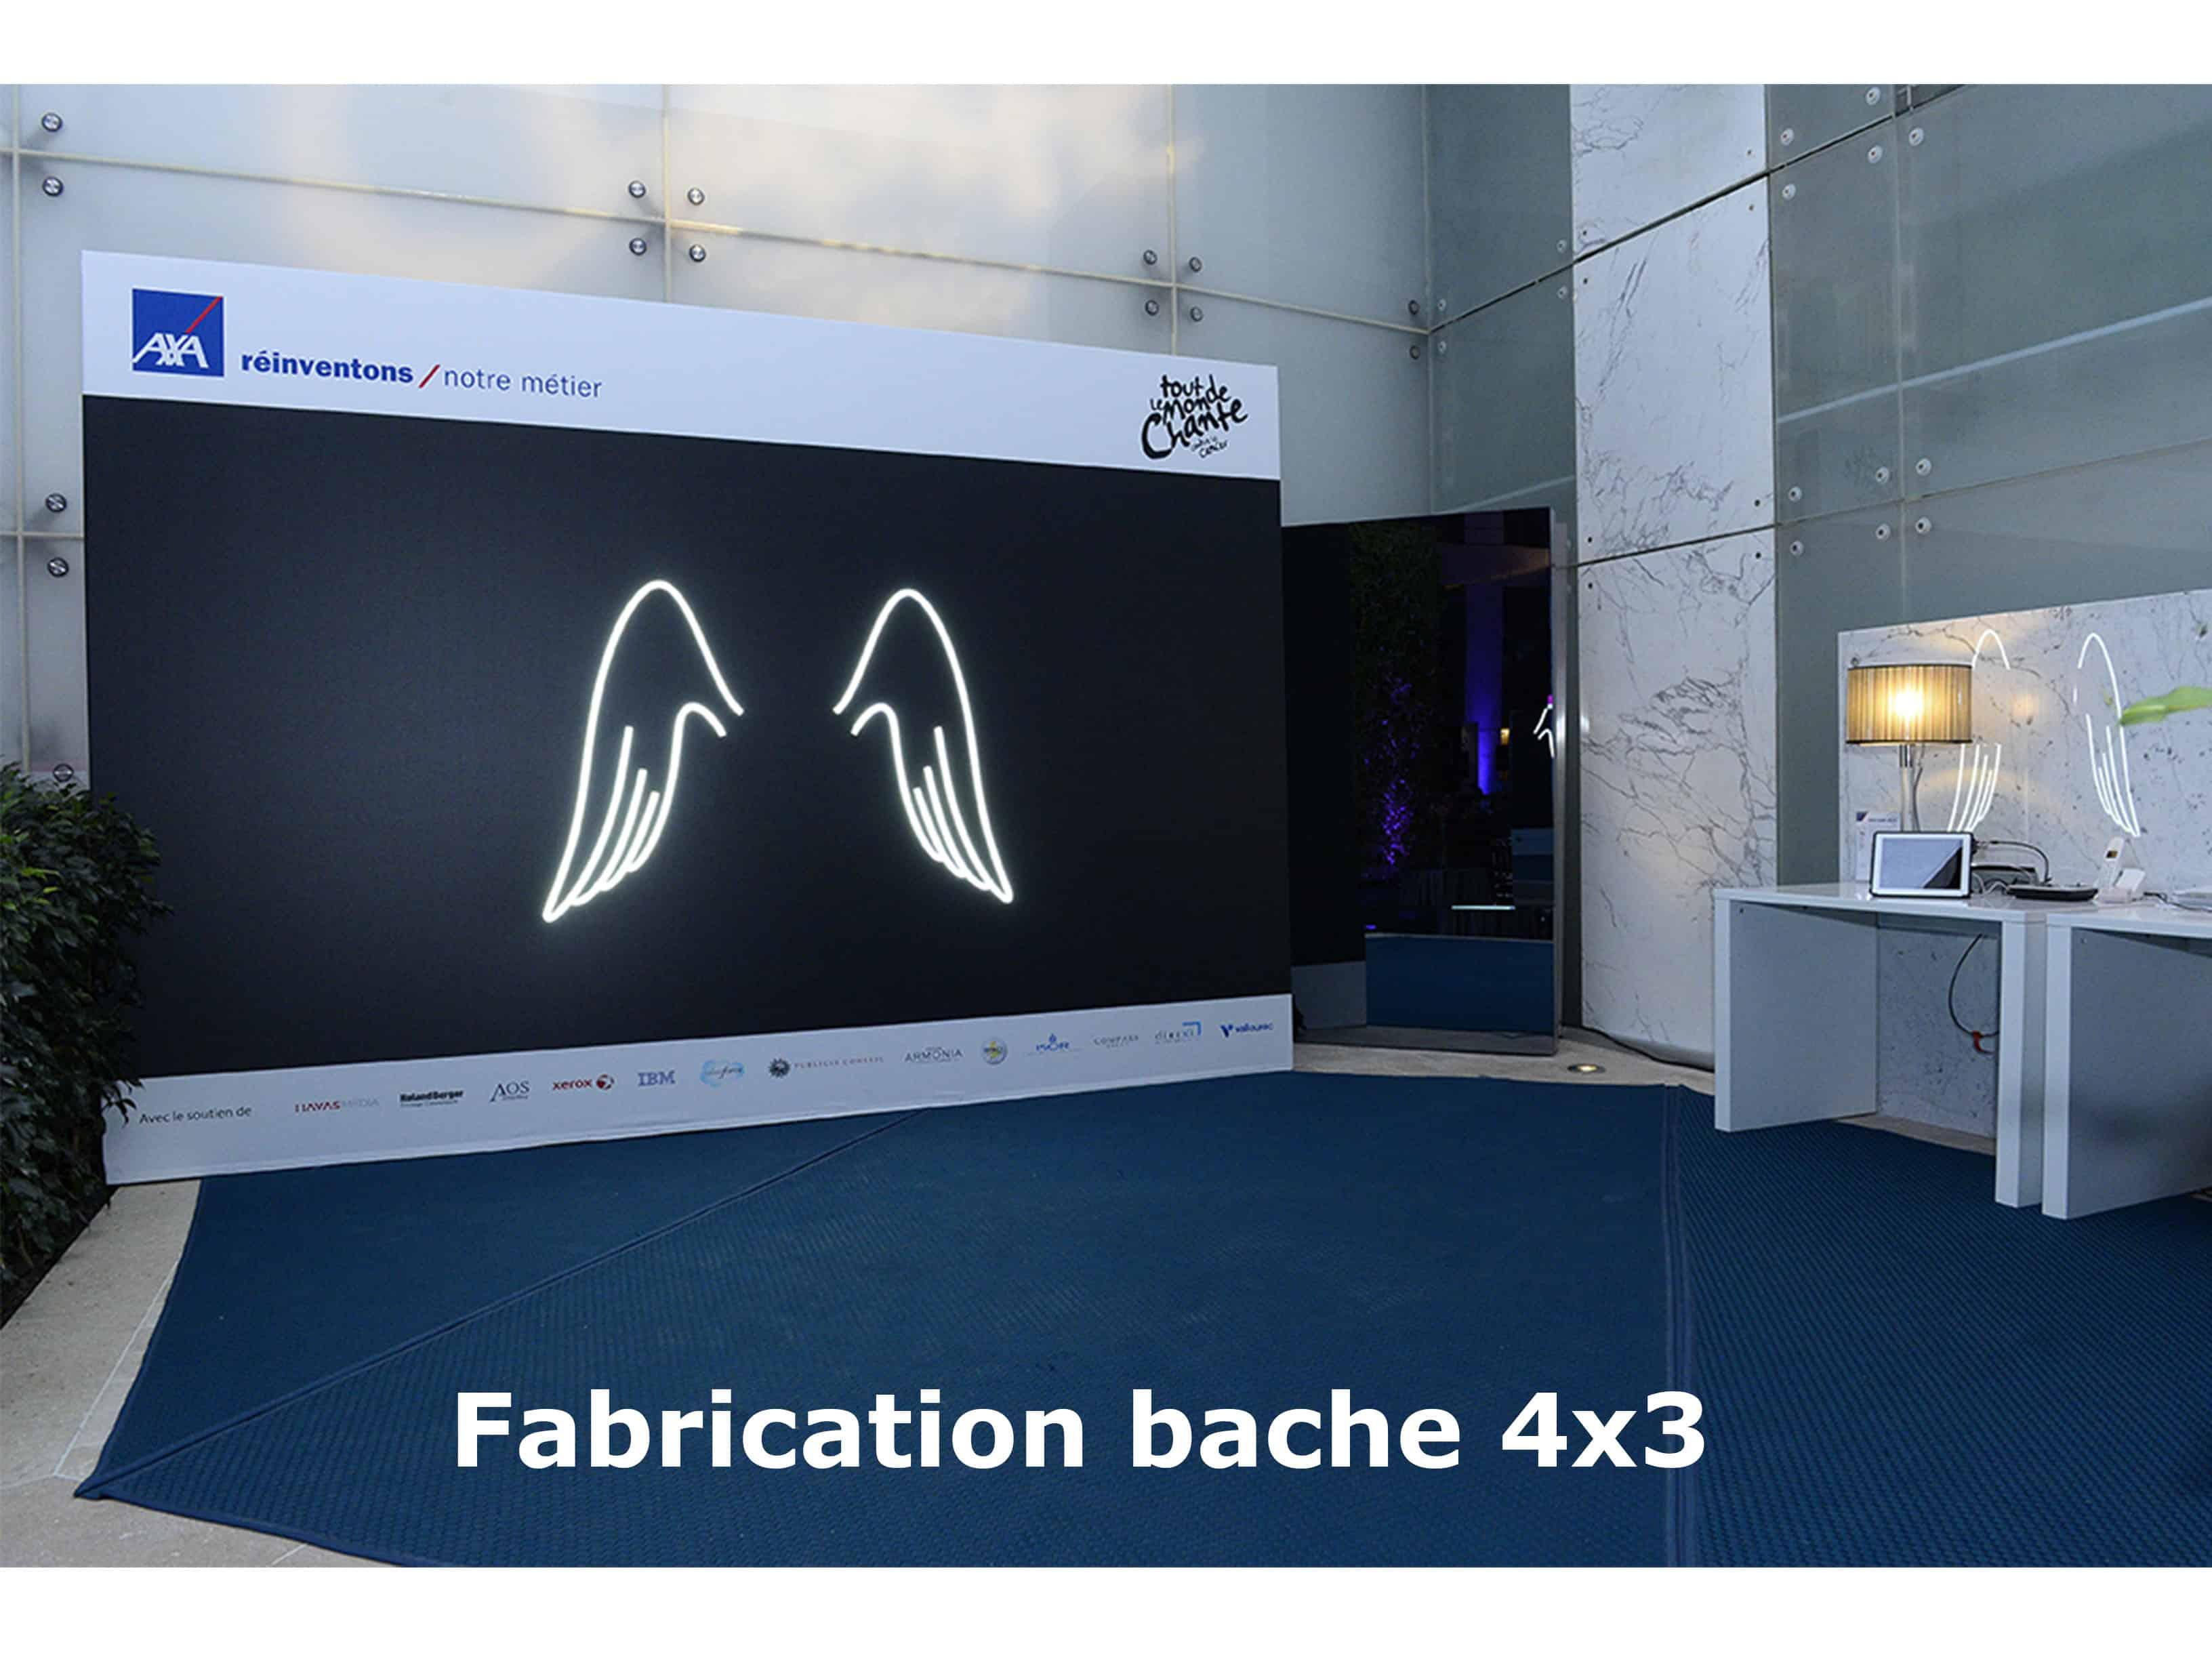 fabrication de bache photobooth 3 - Sharingbox photobooth et videobooth Paris